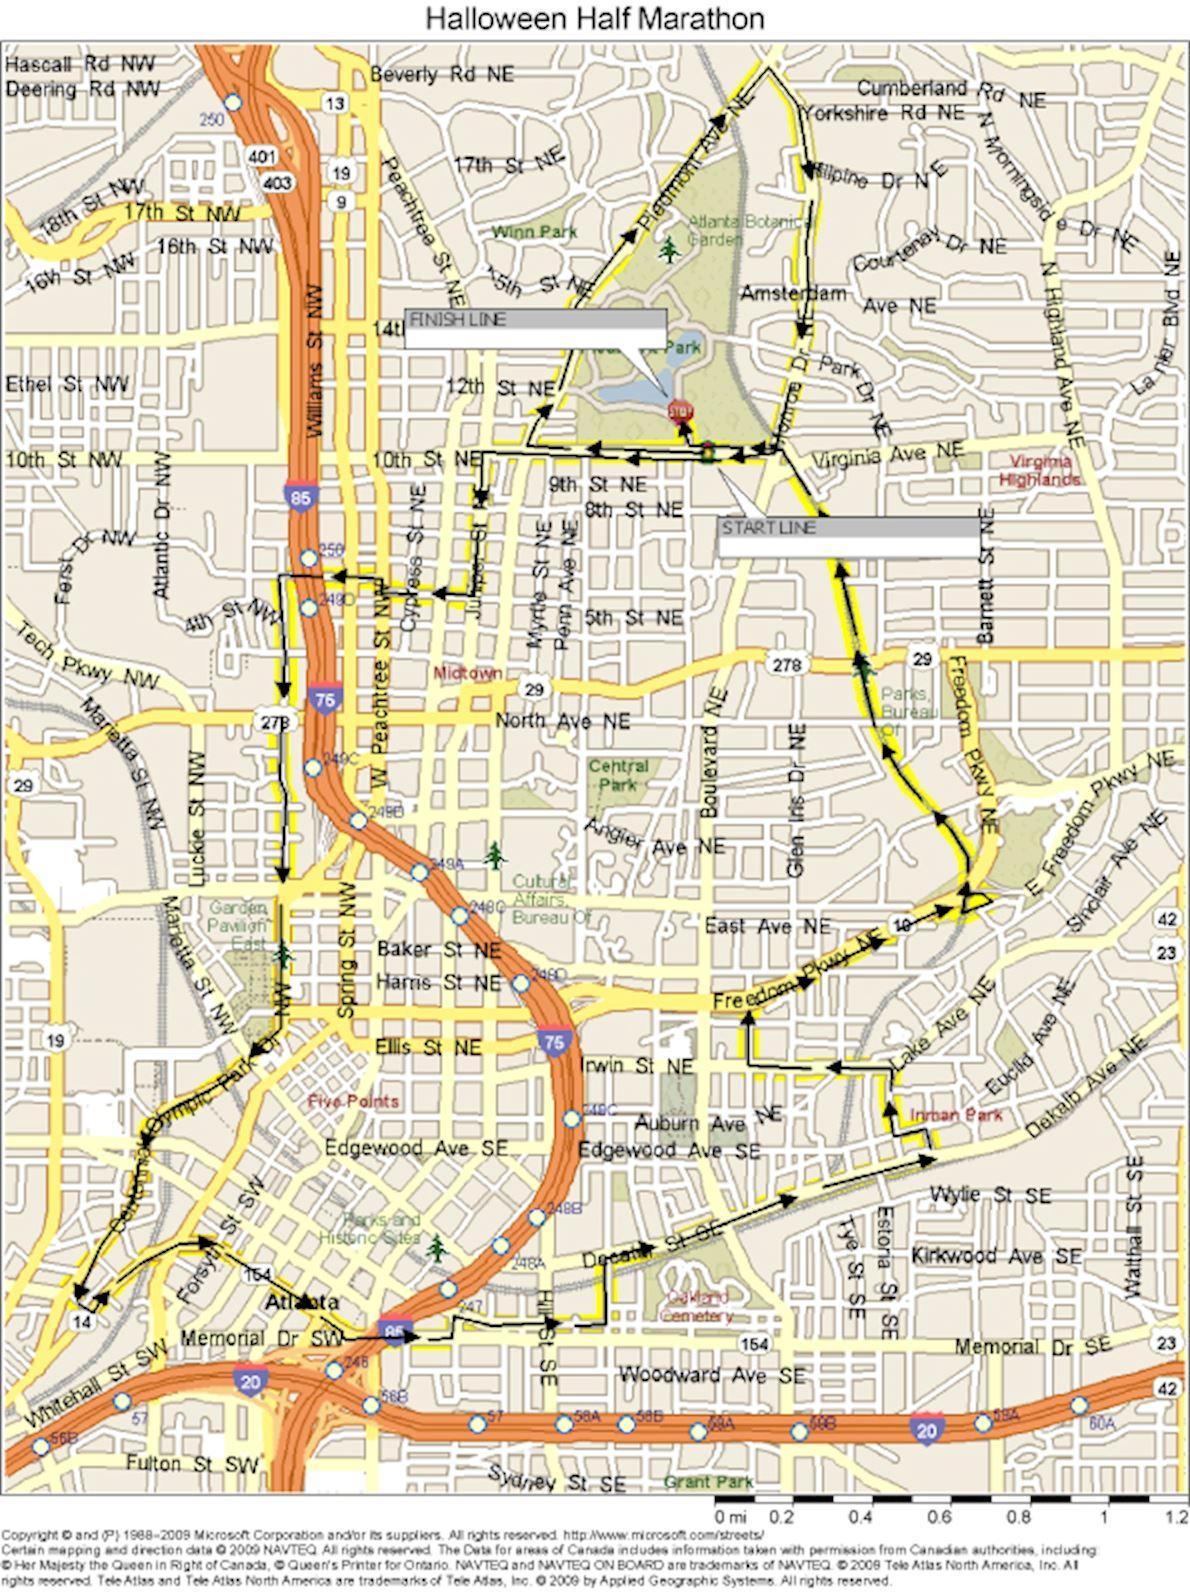 Atlanta Halloween Half Marathon & 5K 路线图